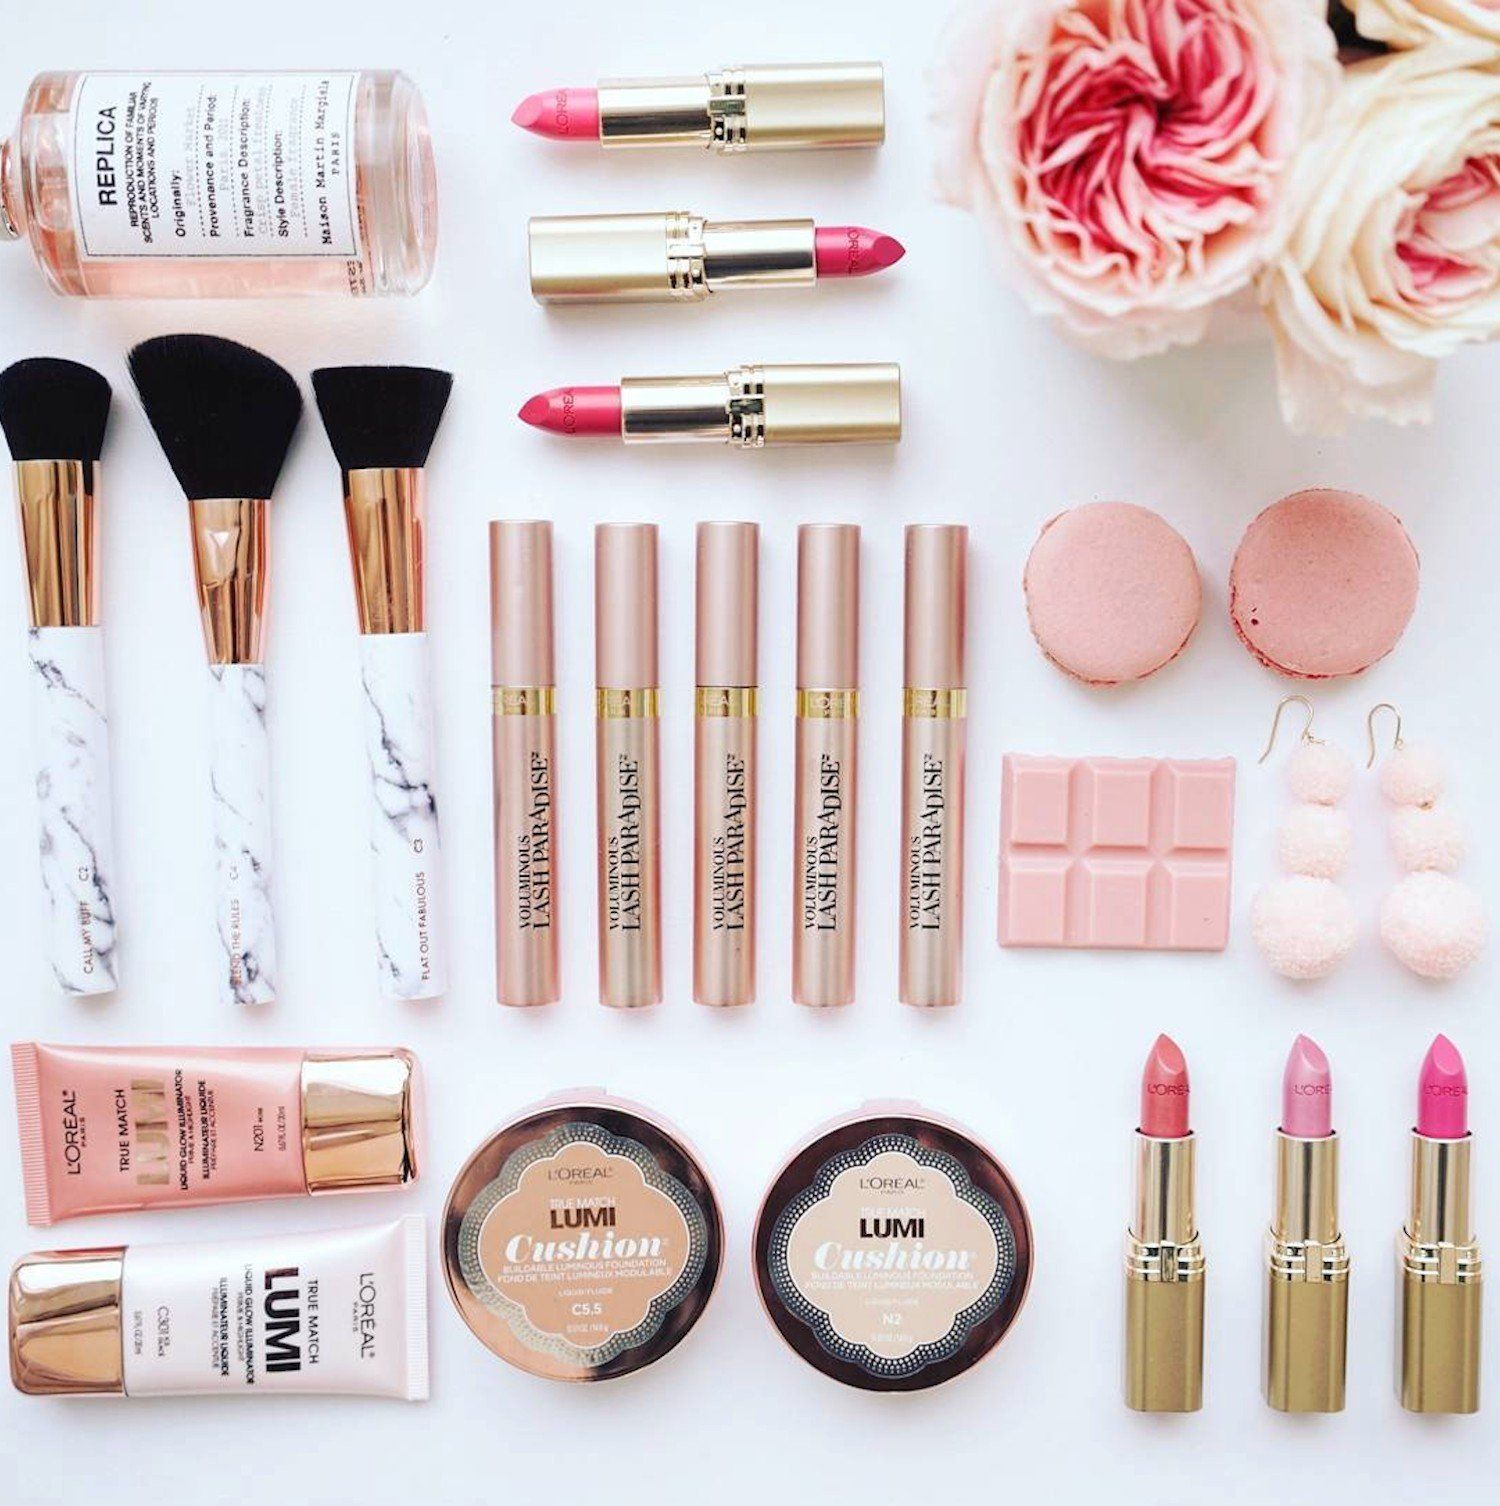 stylish Beauty advisor, Loreal makeup products, Loreal